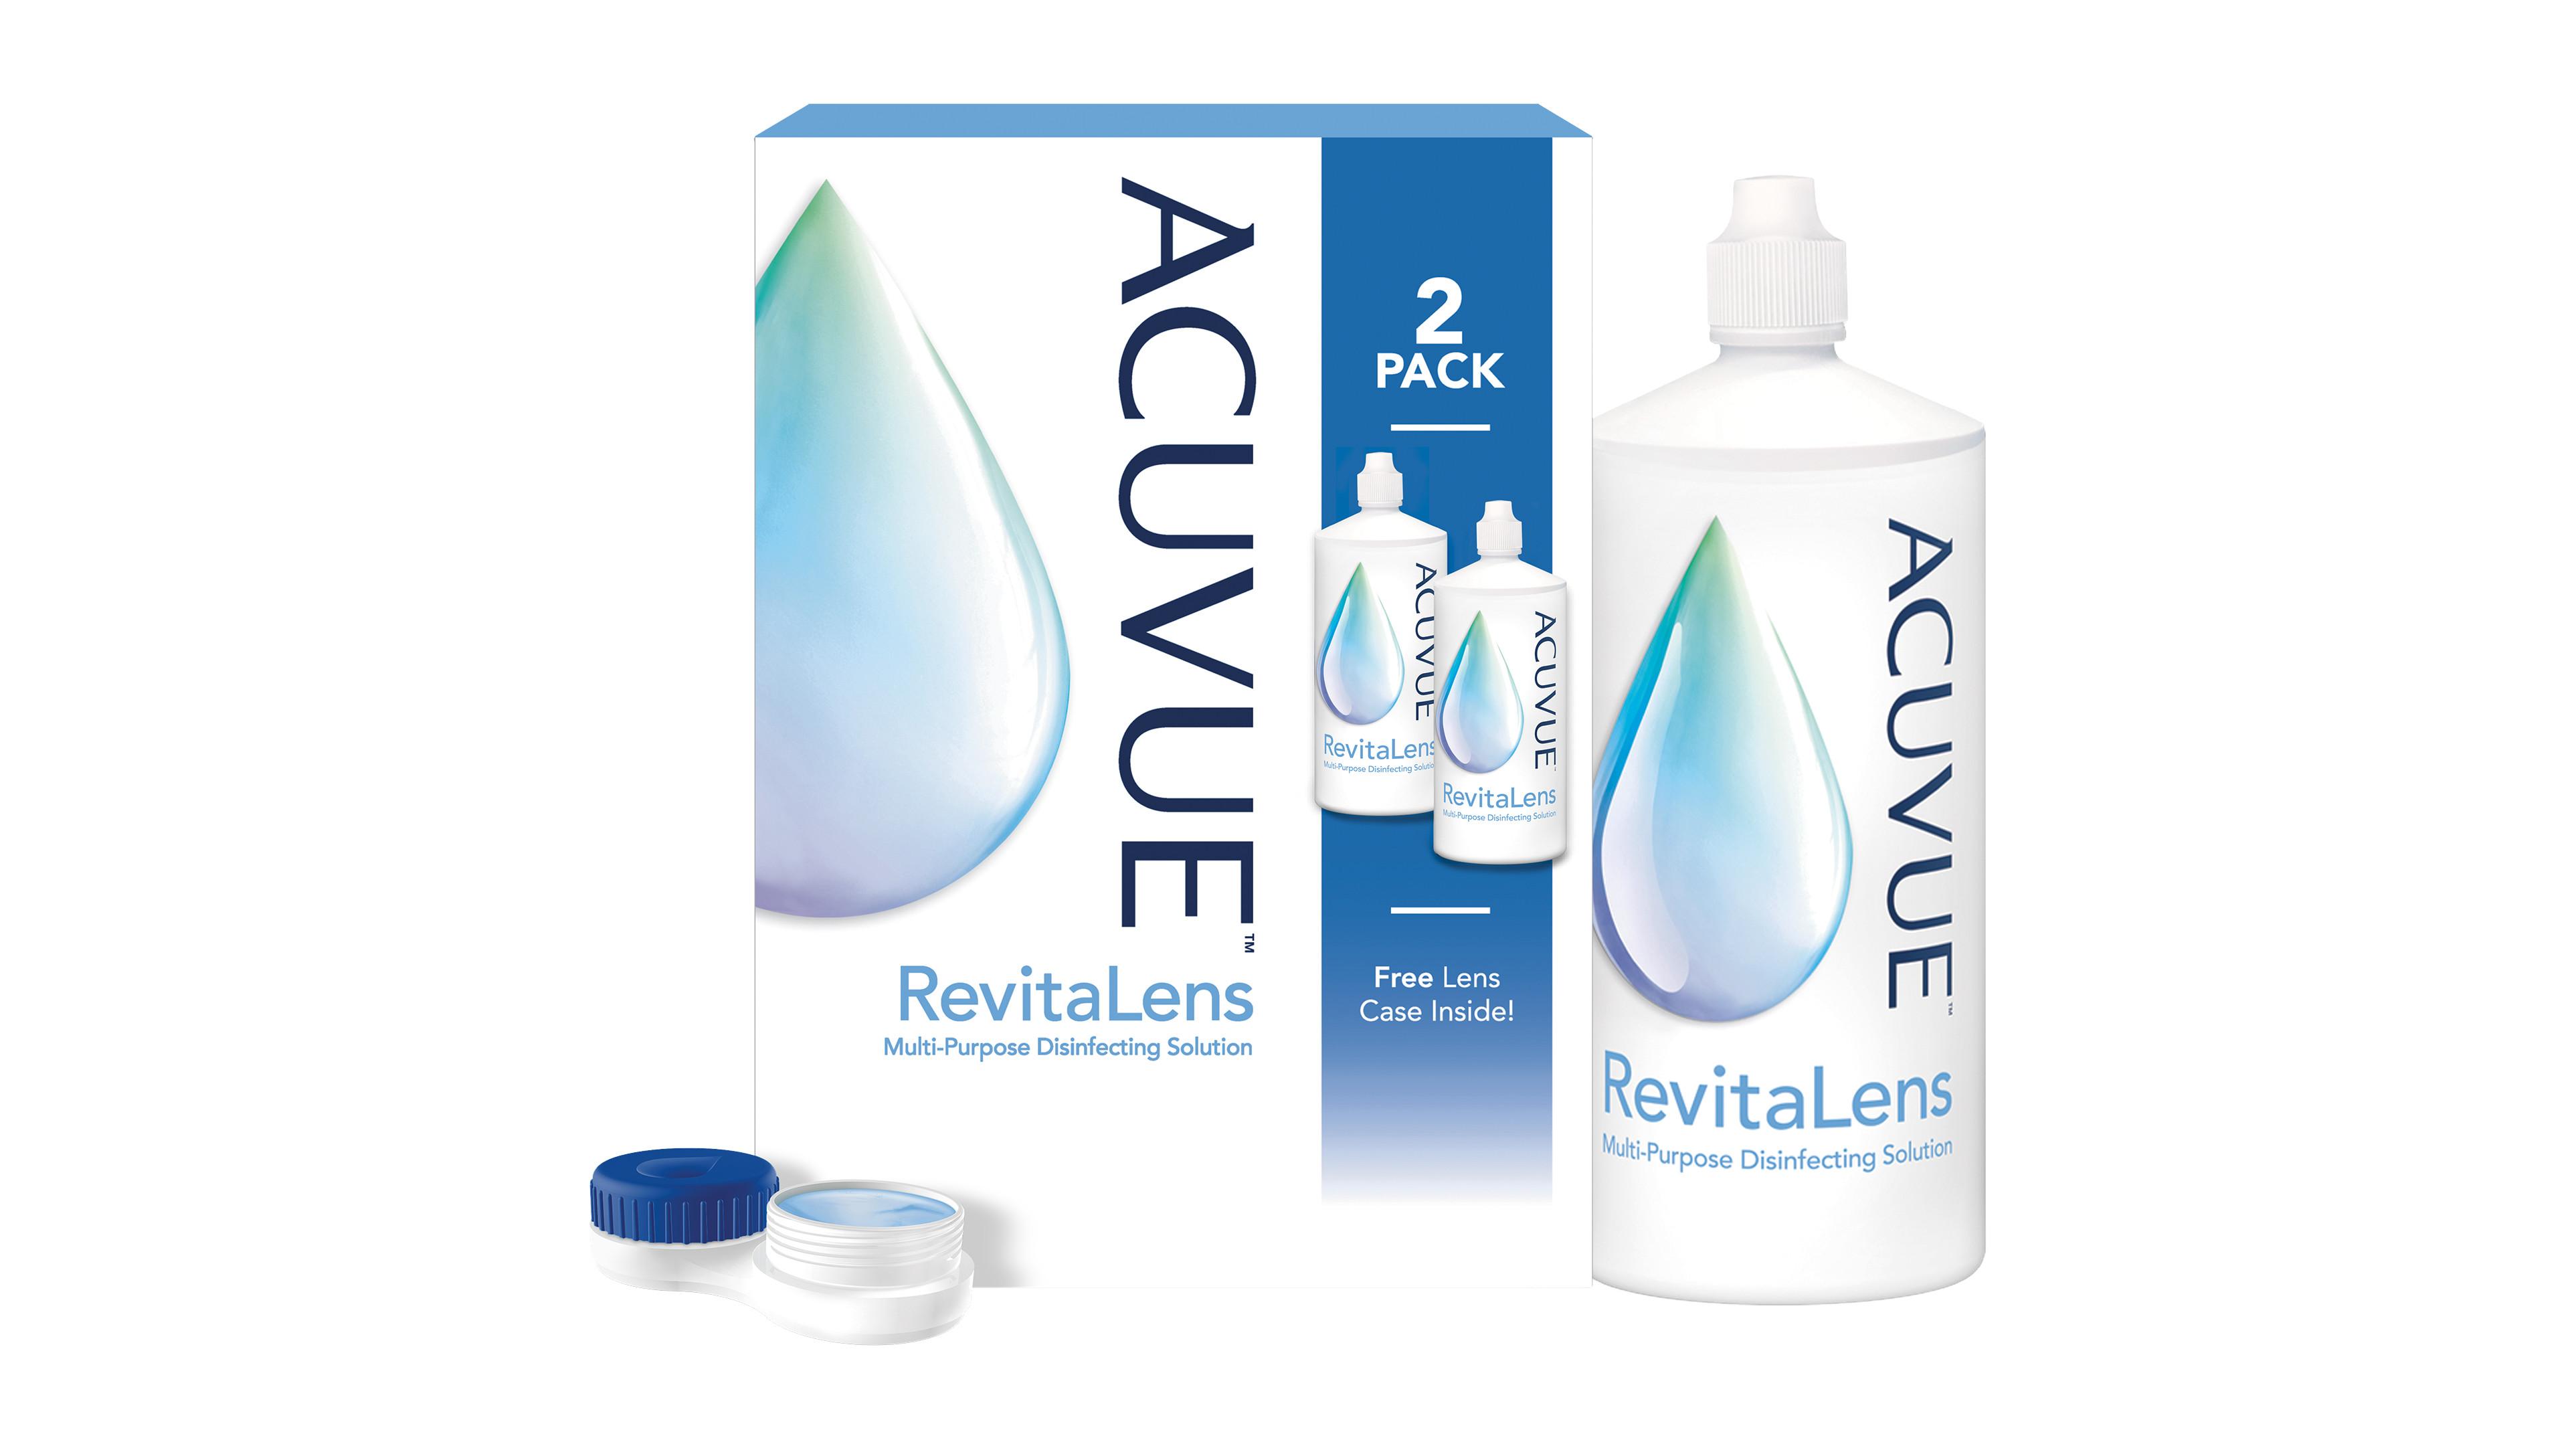 5050474105829-front-kontaktlinsen-pflegemittel-acuvue-revitalens-mpds-sc-2x300ml